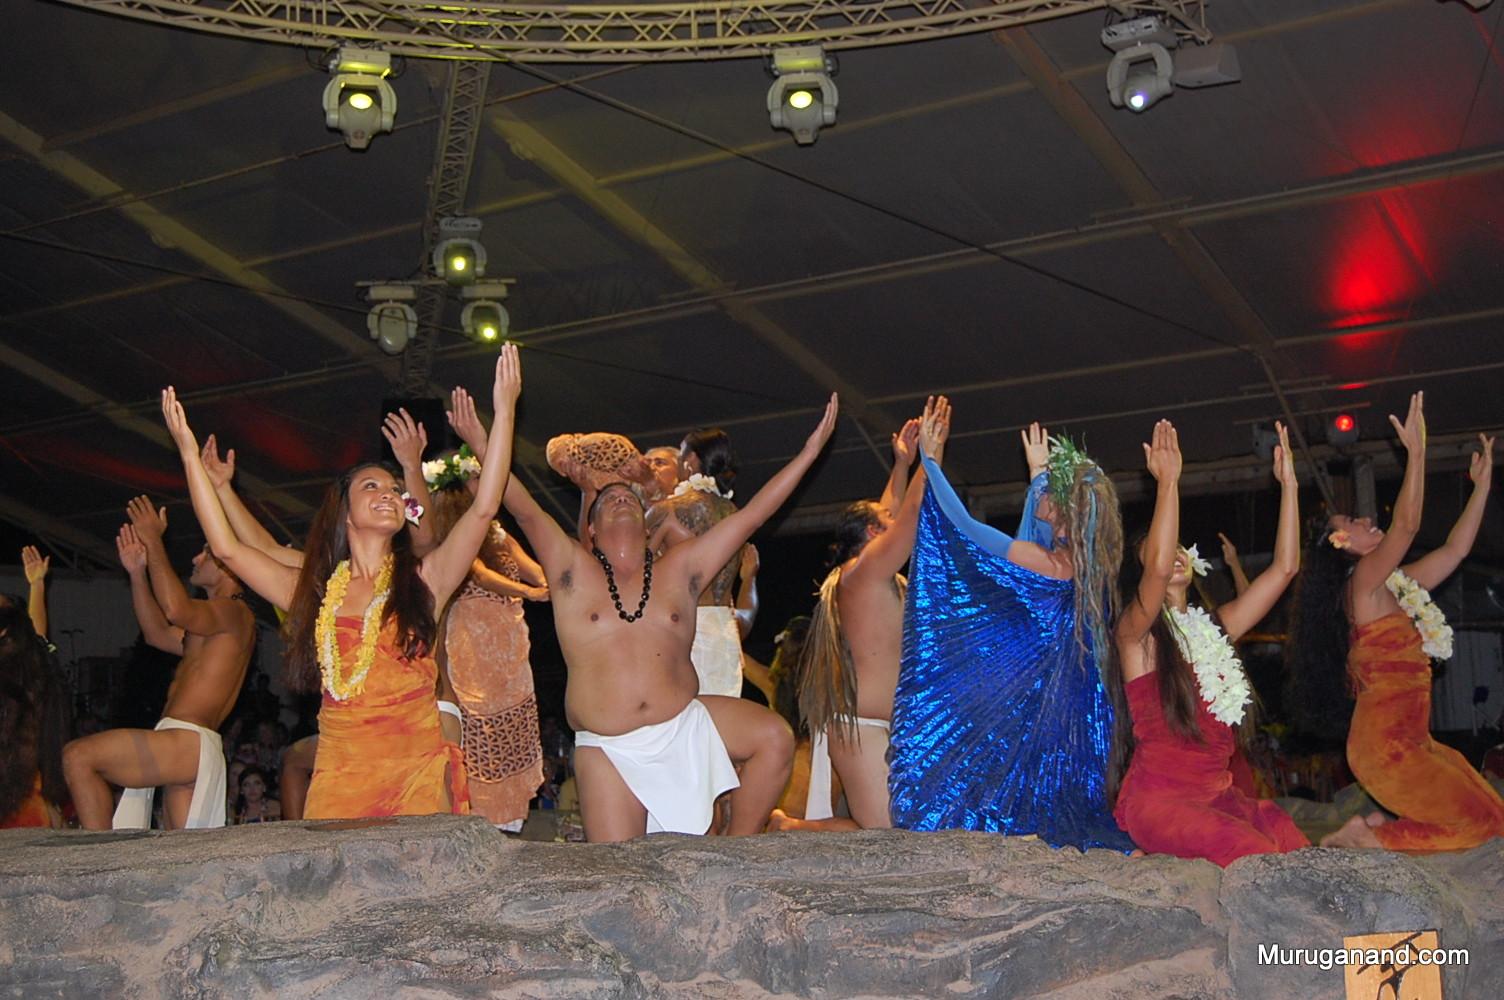 Final Celebration during Luau Performance (Kauai)